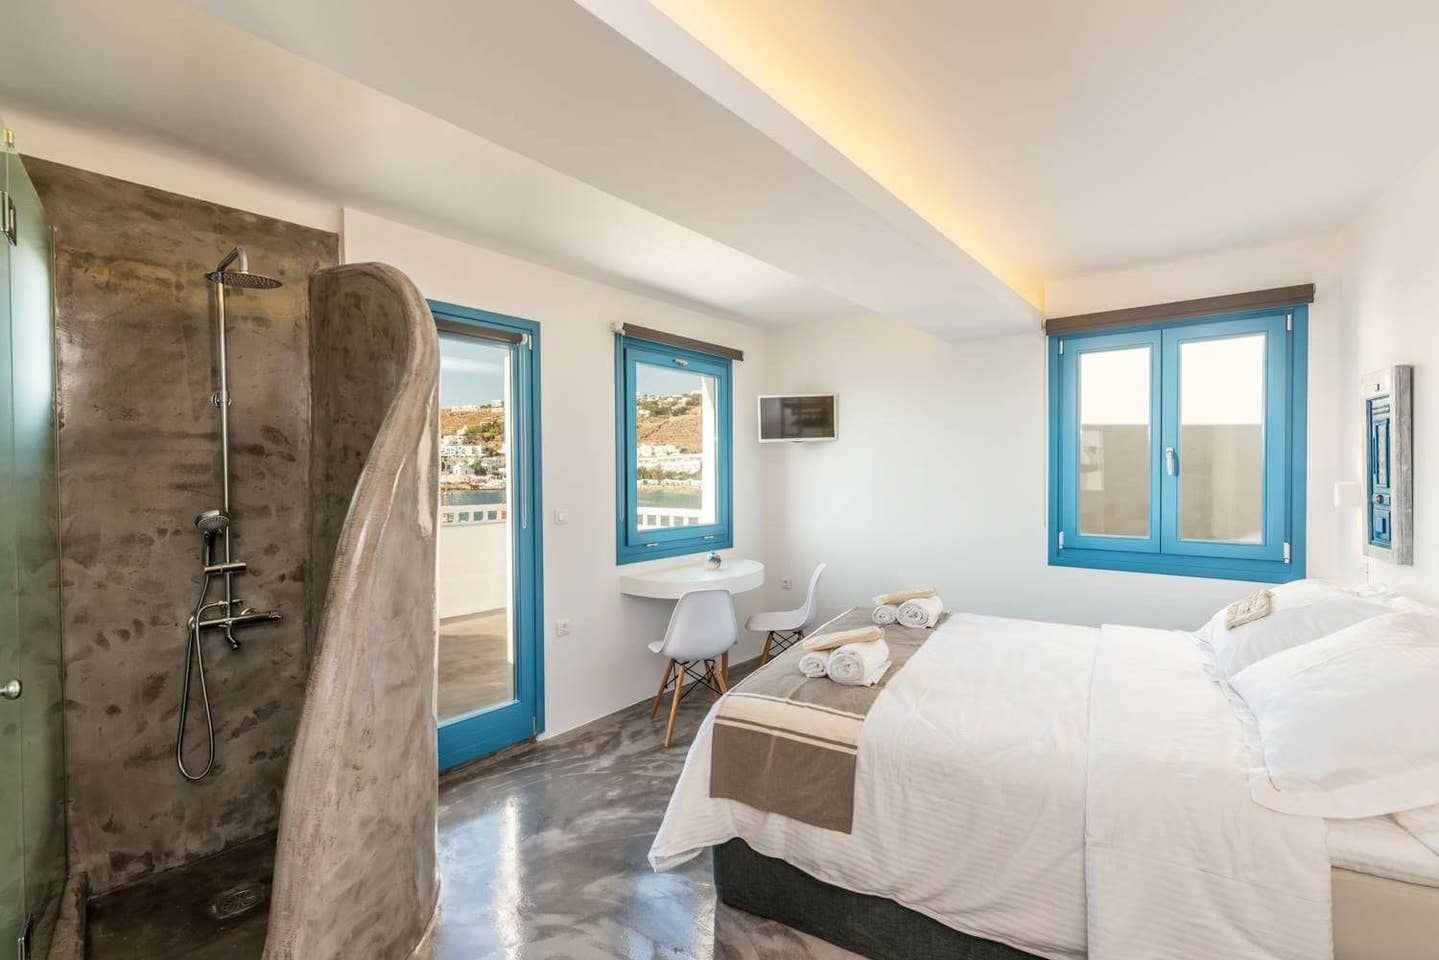 Studio Apartment Mykonos Airbnb